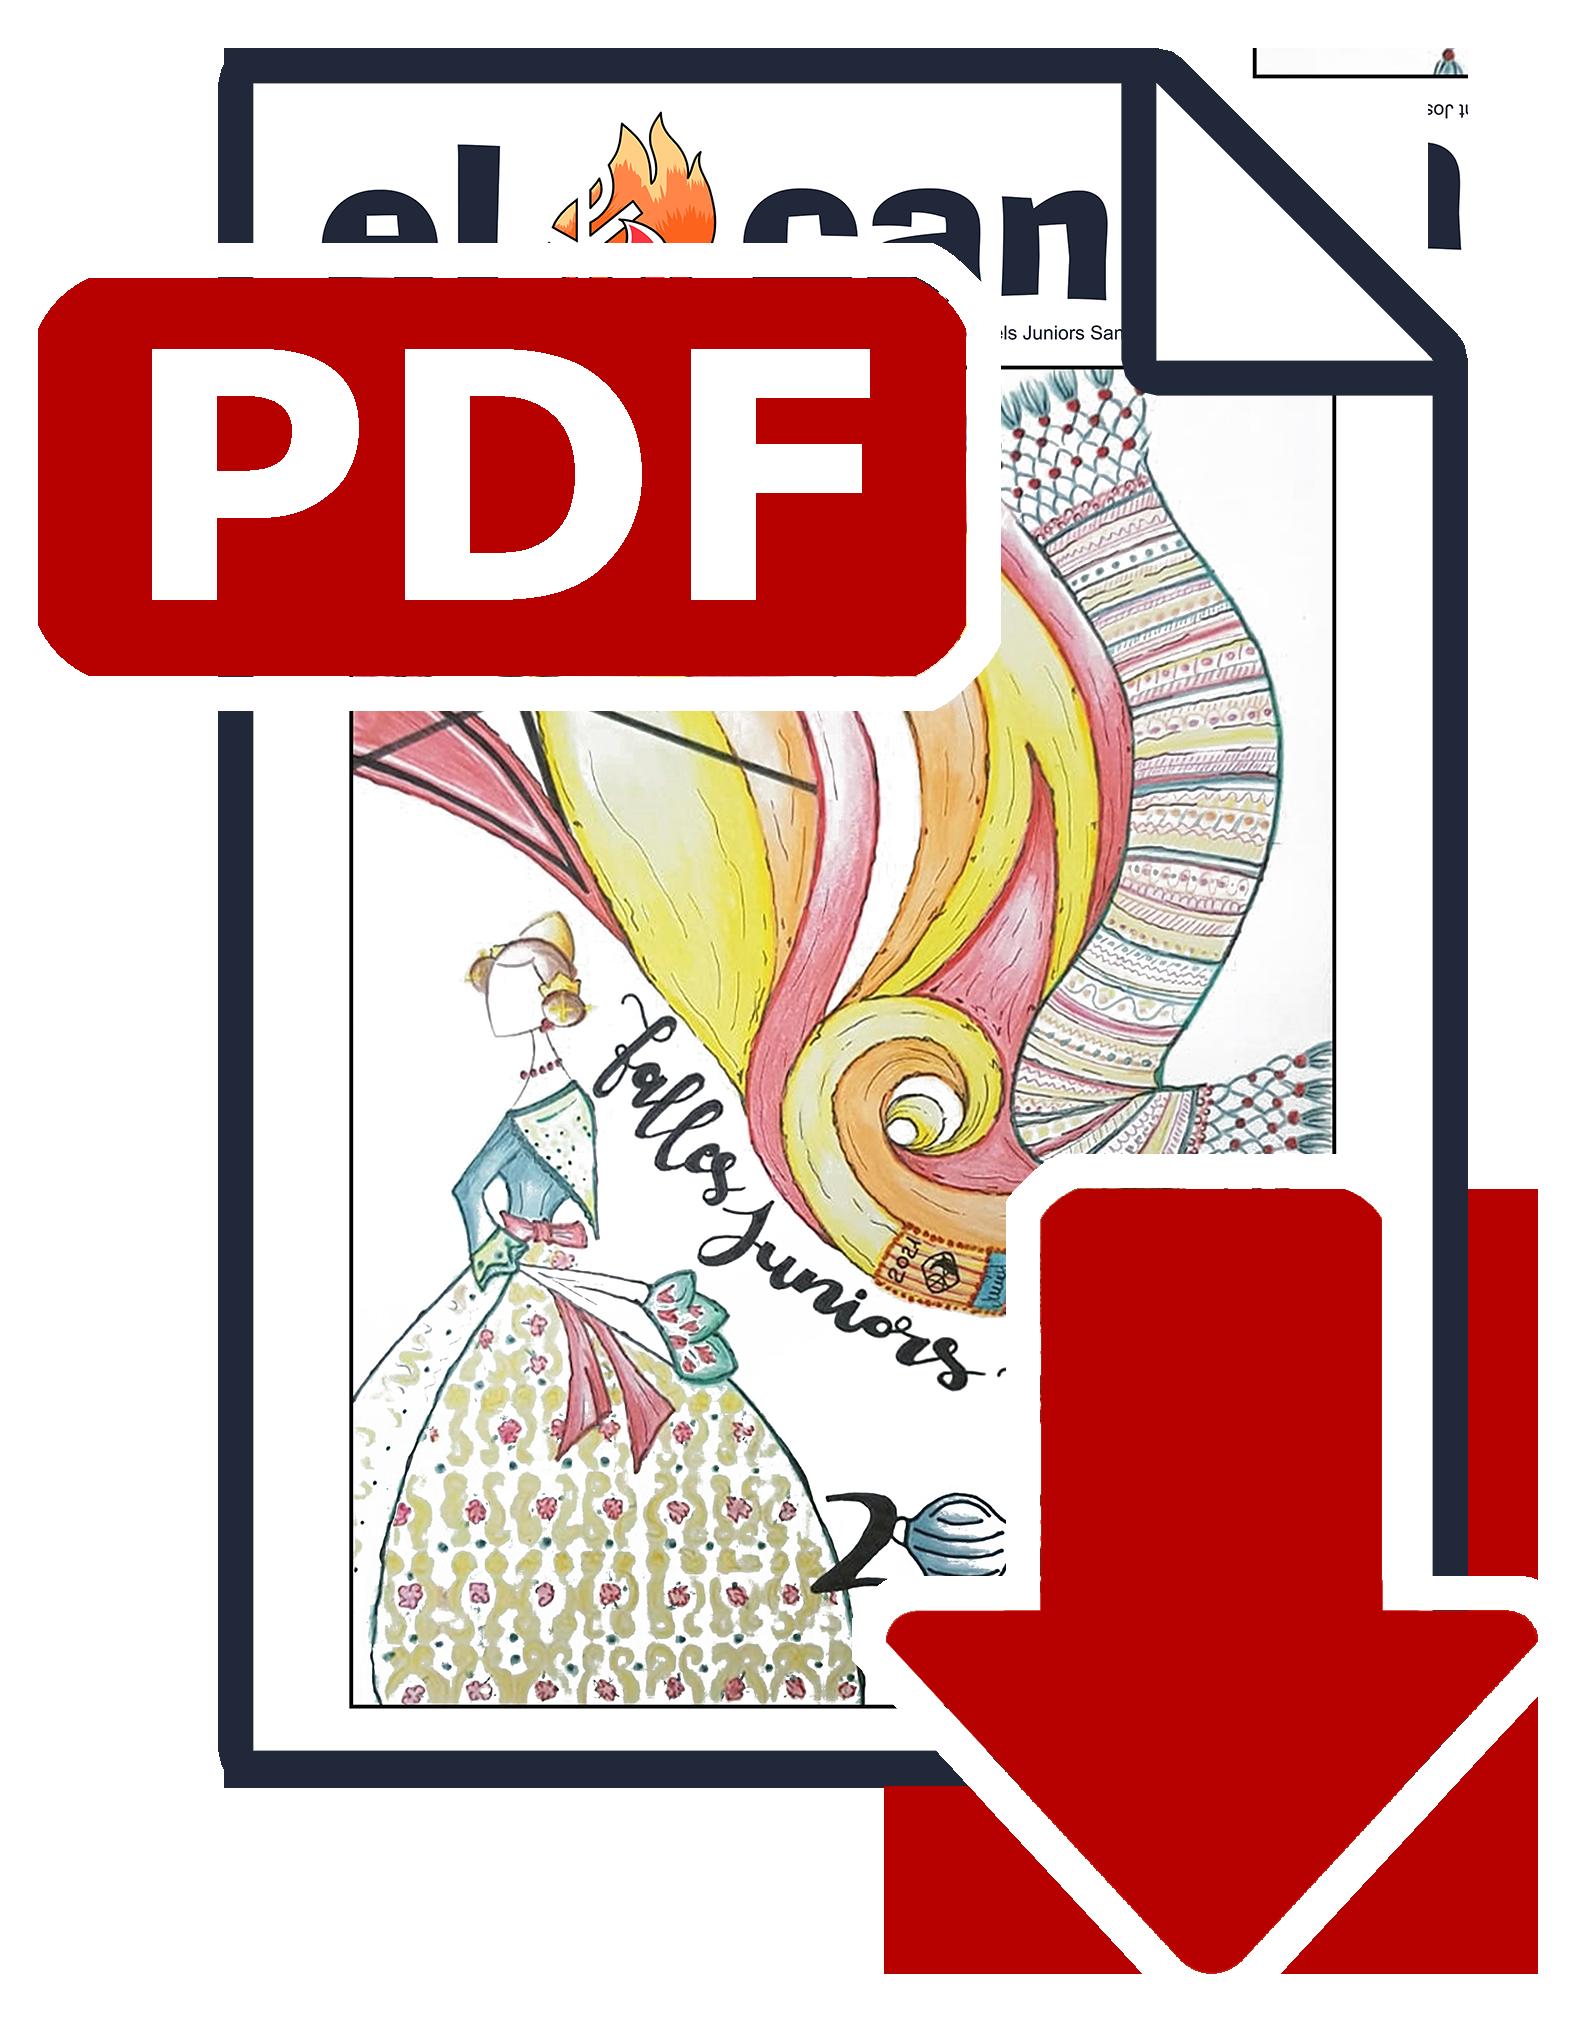 Descarrega en PDF